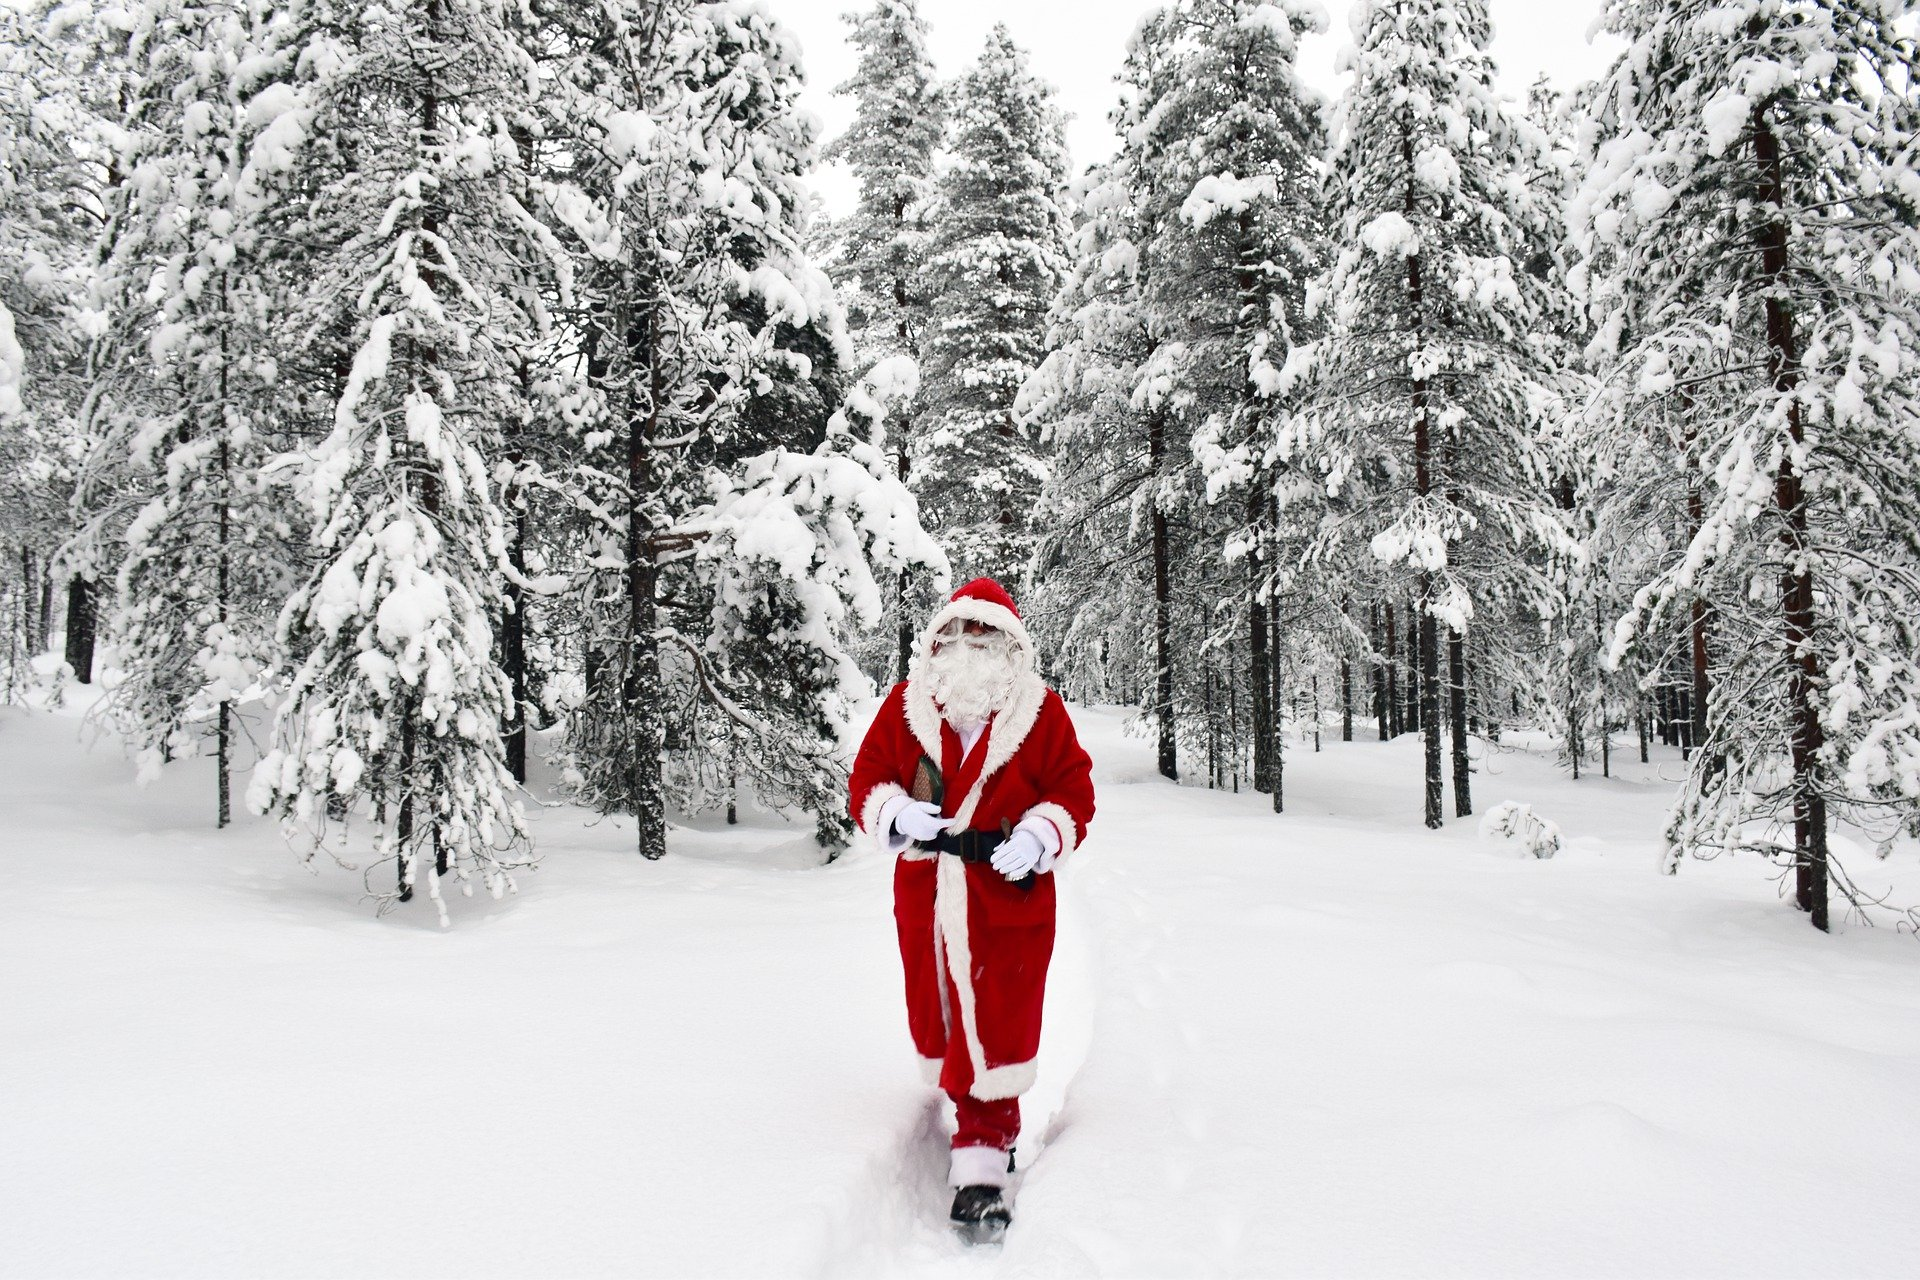 Swiss Christmas traditions - Samichlaus